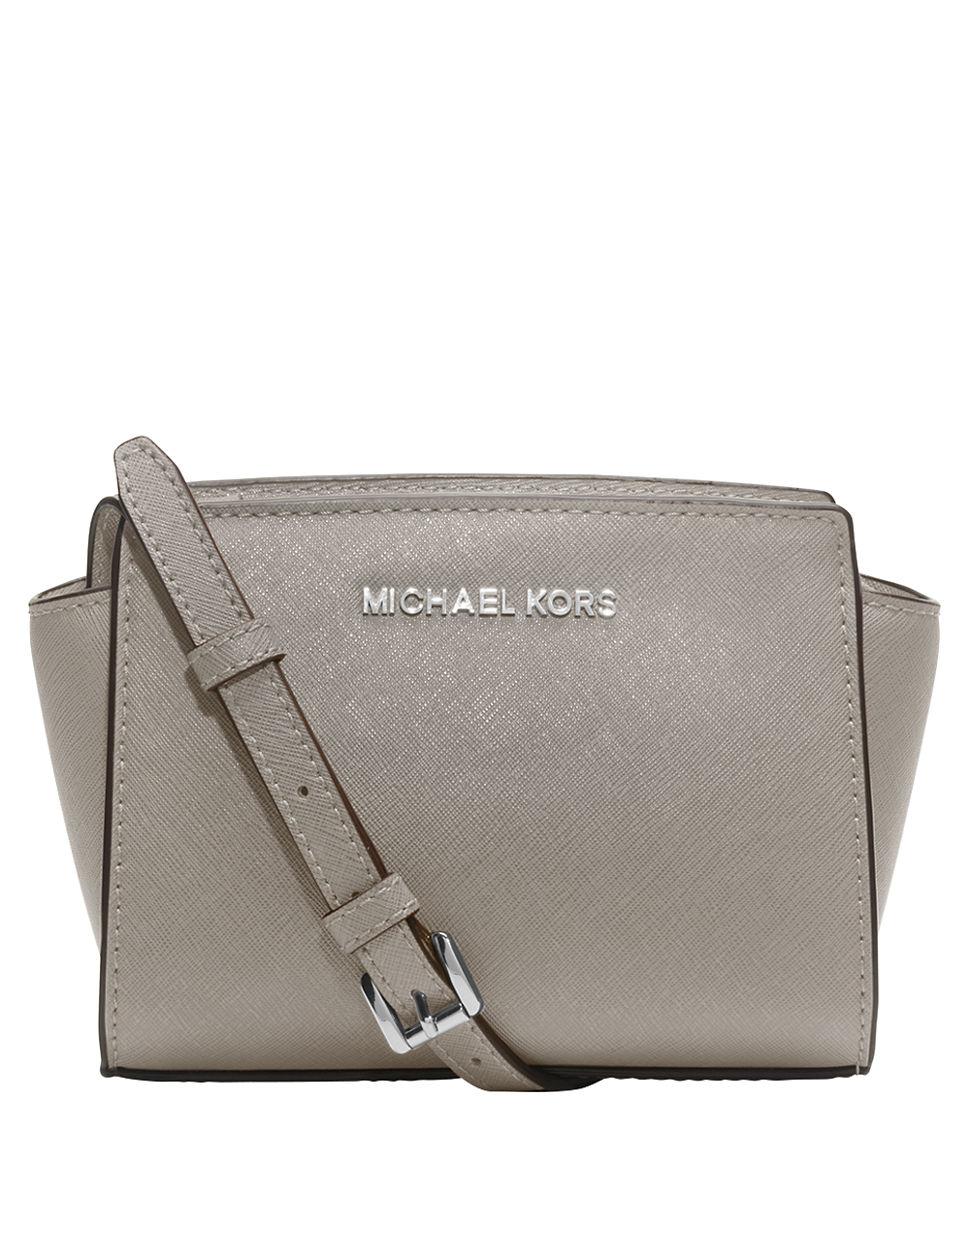 Laukut Michael Kors : Michael kors selma mini messenger bag car